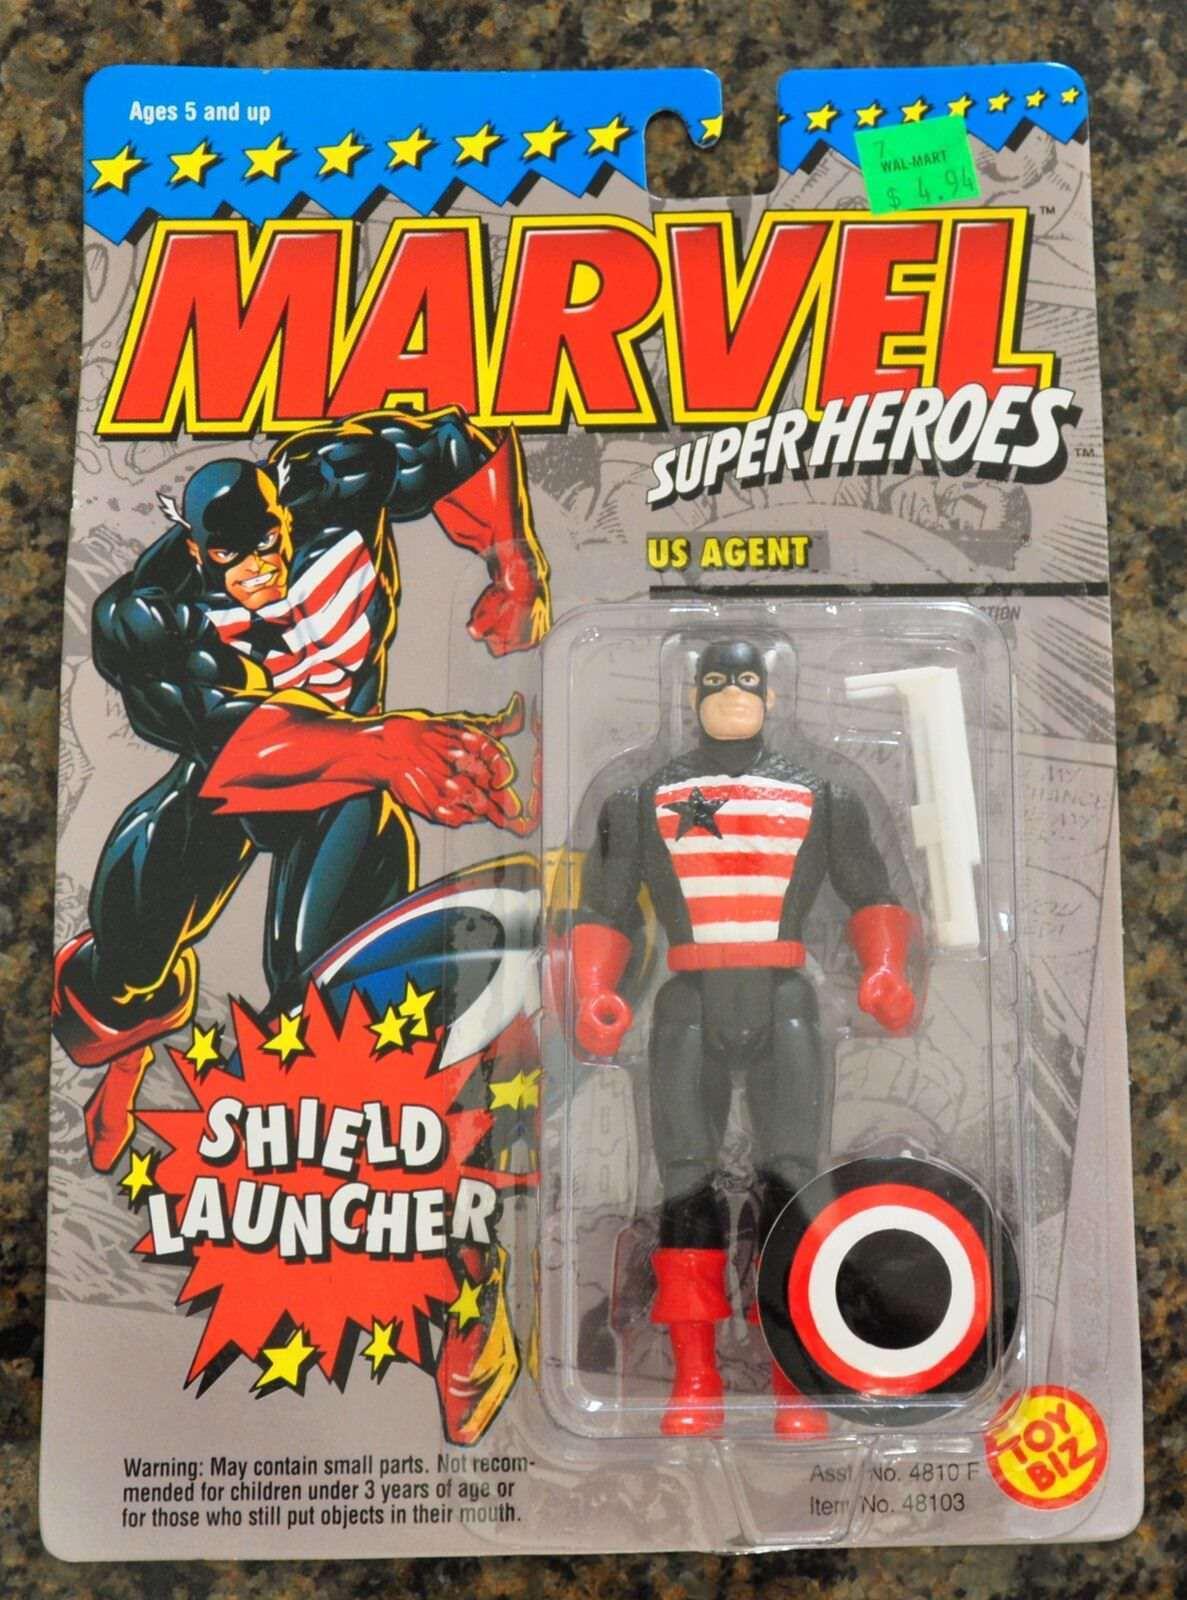 ToyBiz Marvel Super Heroes Action Figure Mint on Card (MOC)